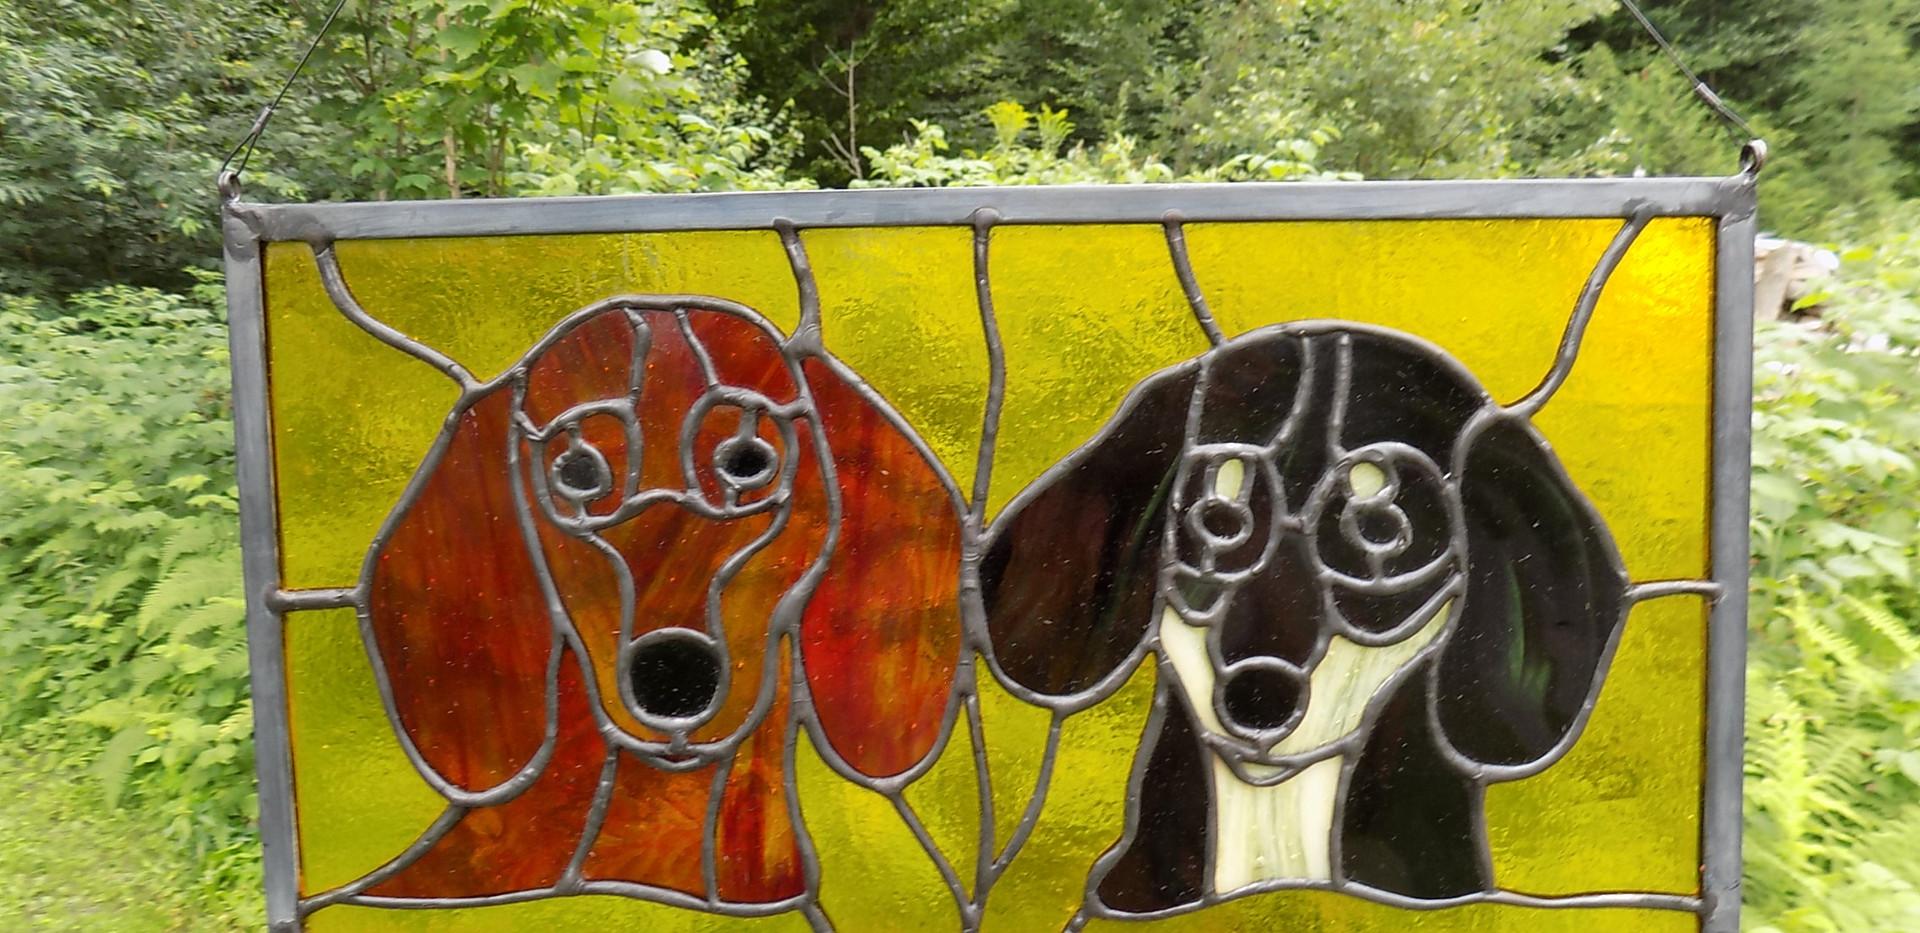 dachshunds.JPG